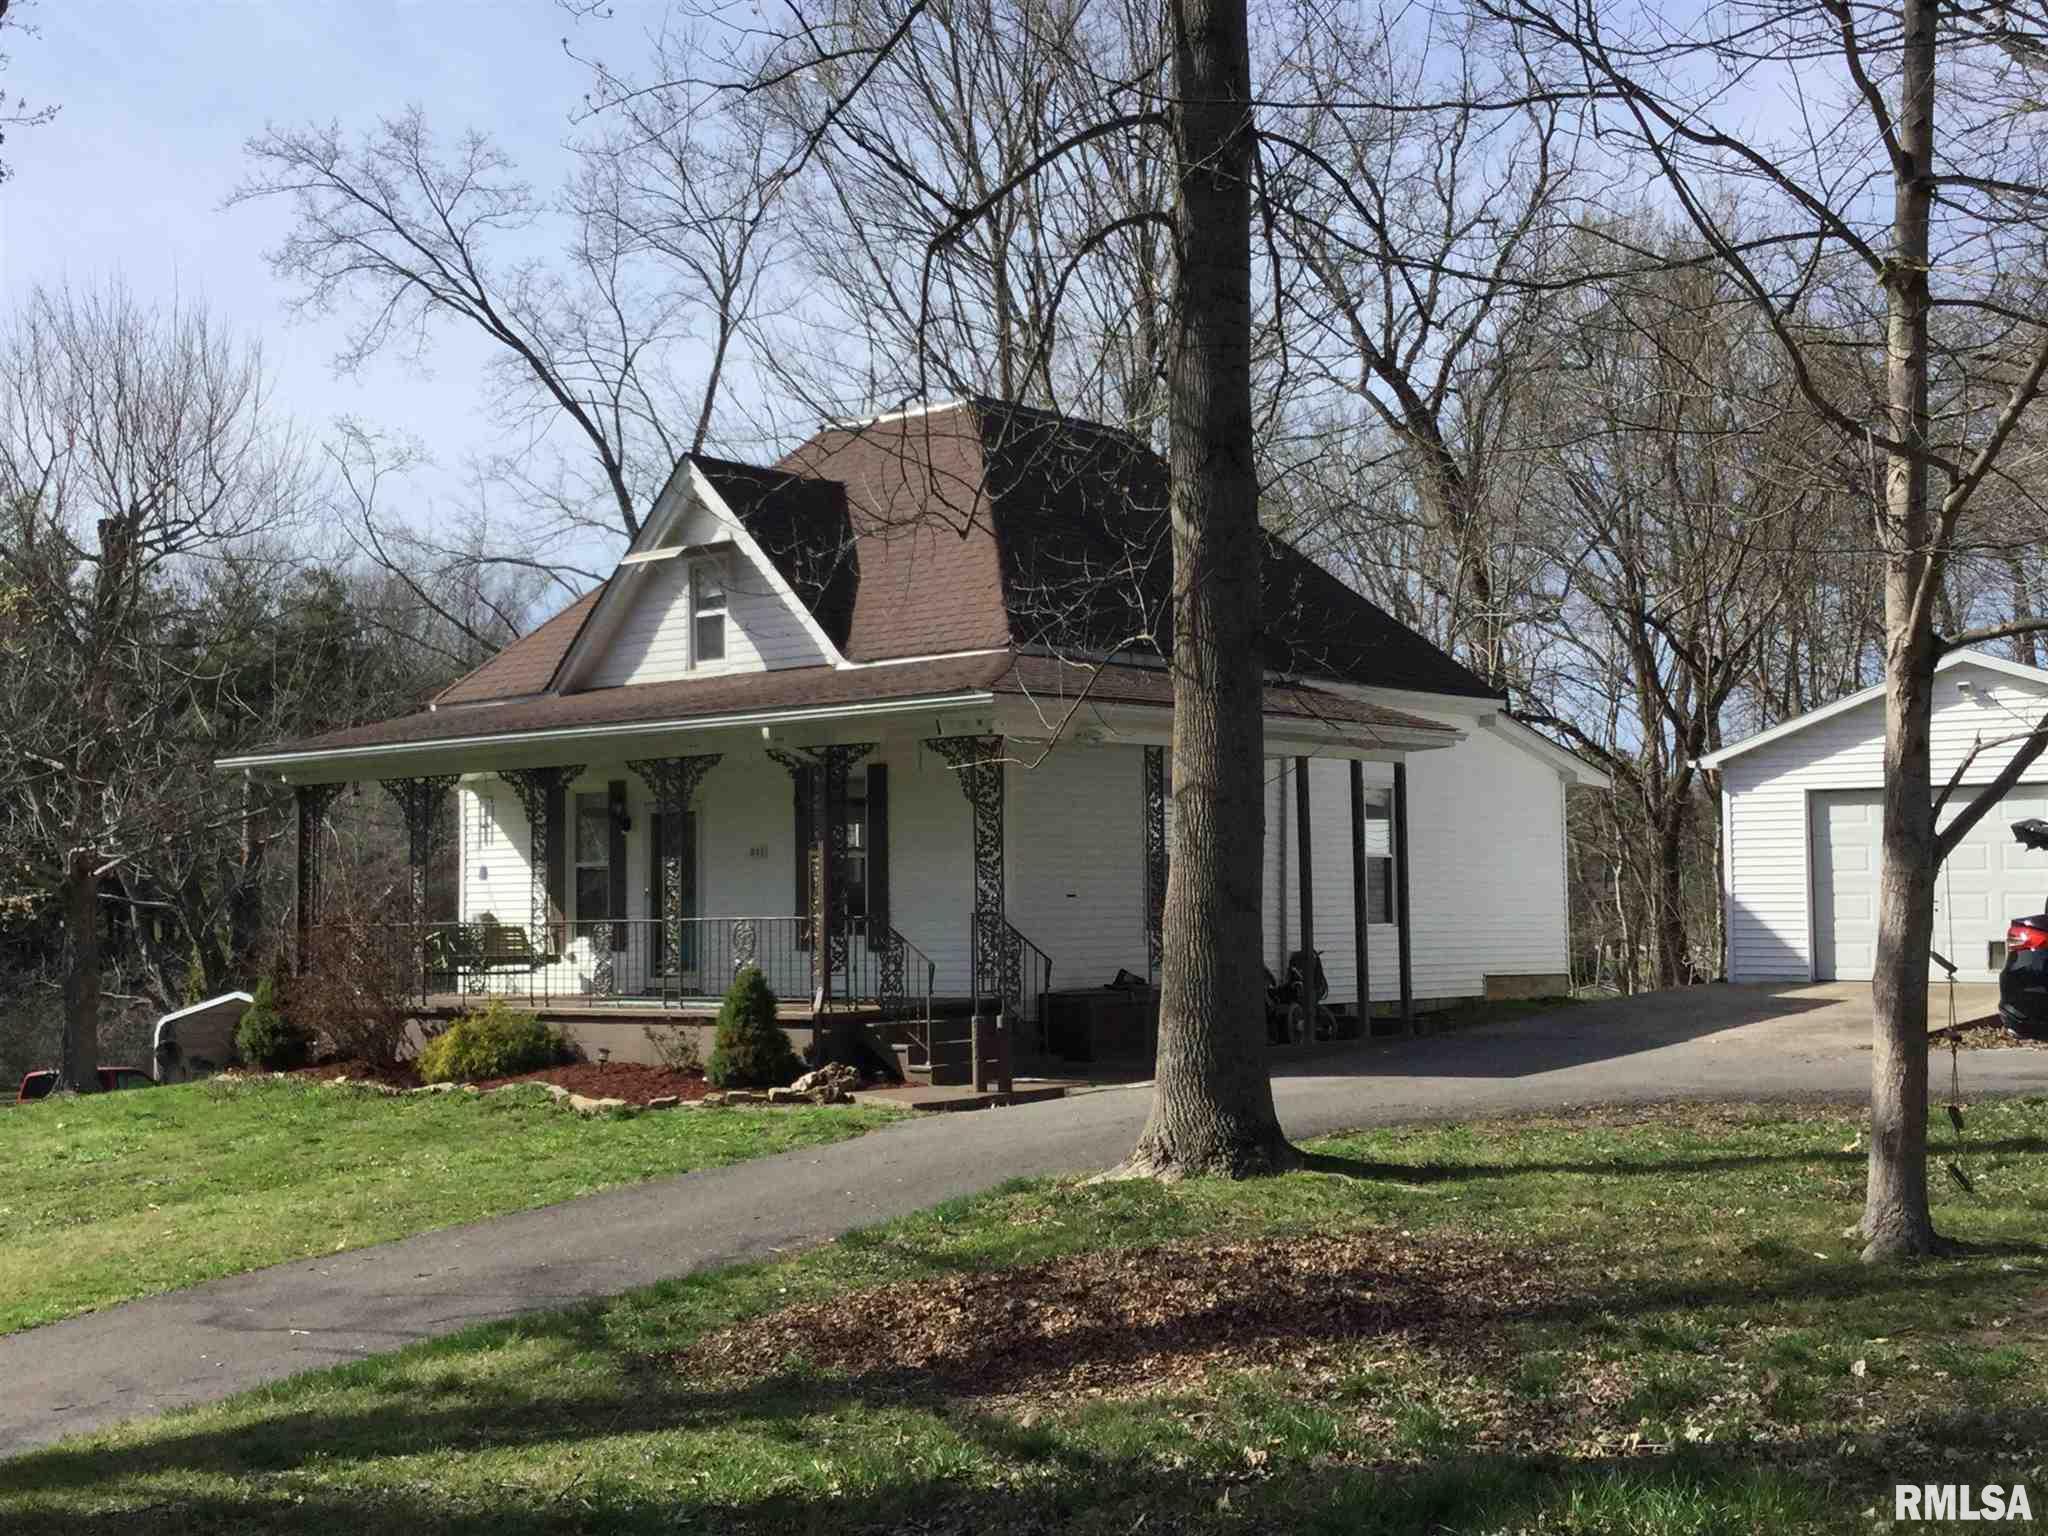 311 W POPLAR Property Photo - Cobden, IL real estate listing